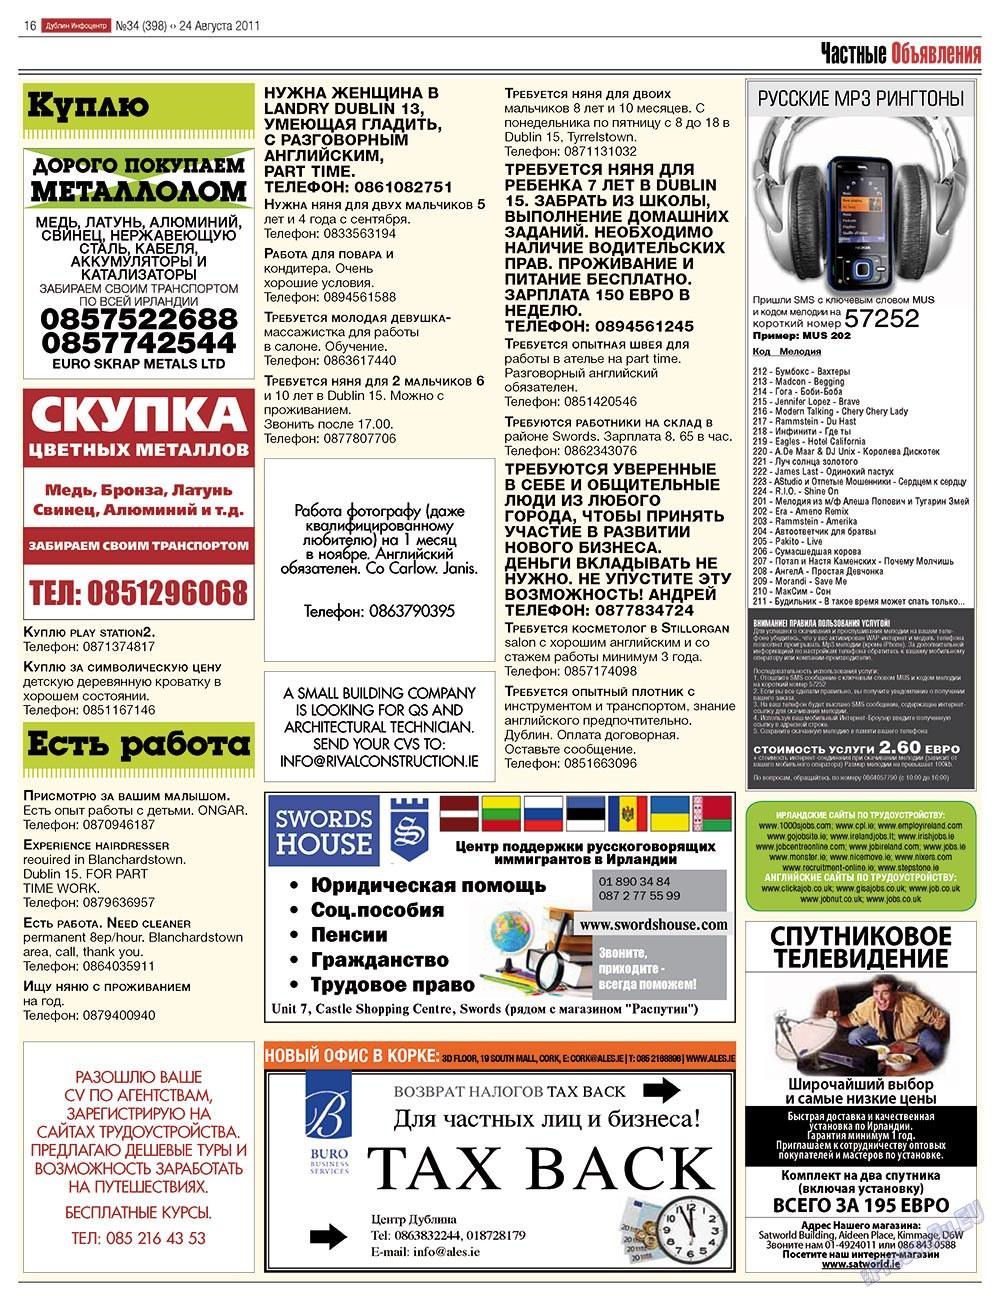 Дублин инфоцентр (газета). 2011 год, номер 34, стр. 16